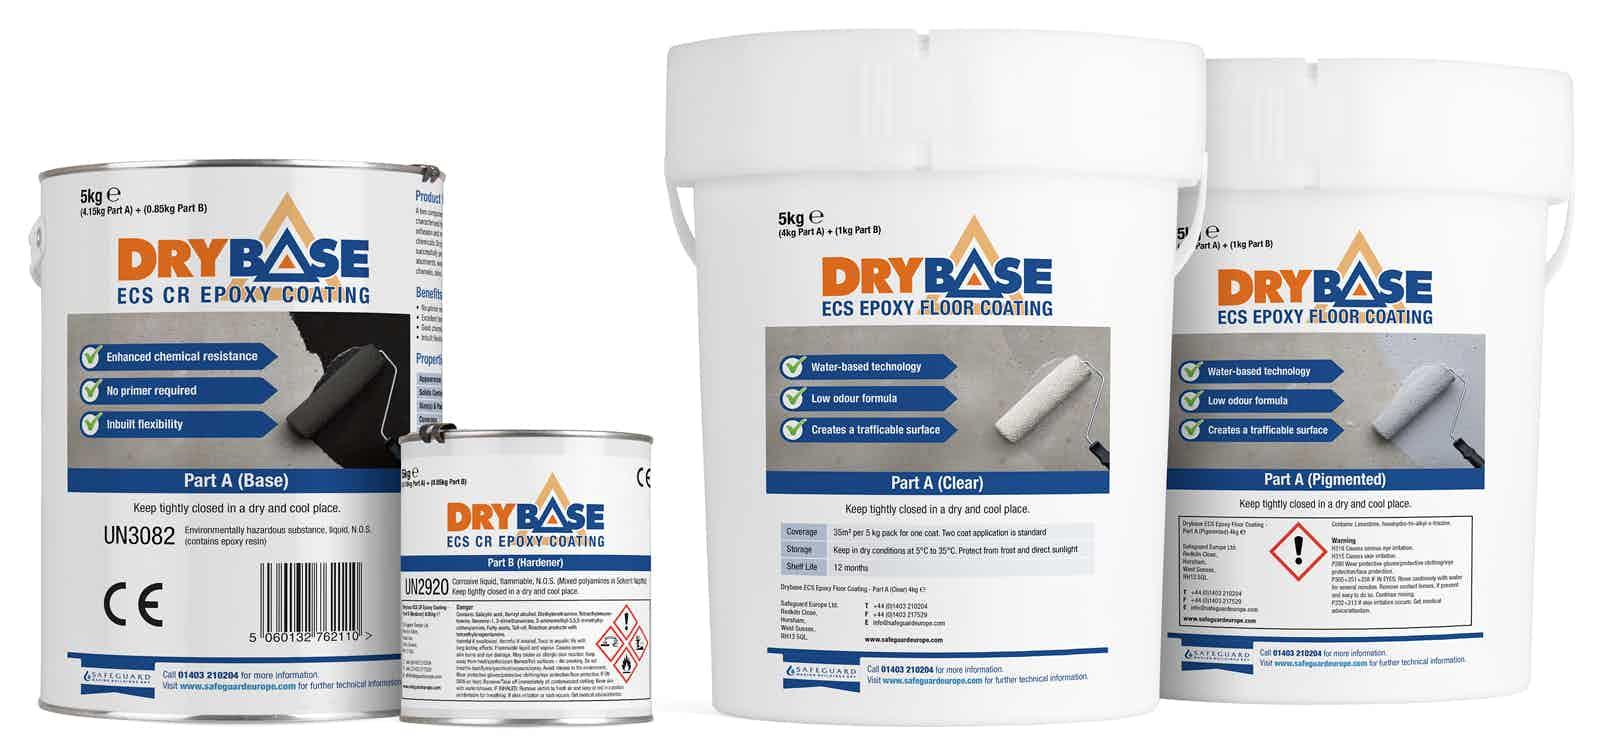 Drybase ECS Epoxy Floor Coating